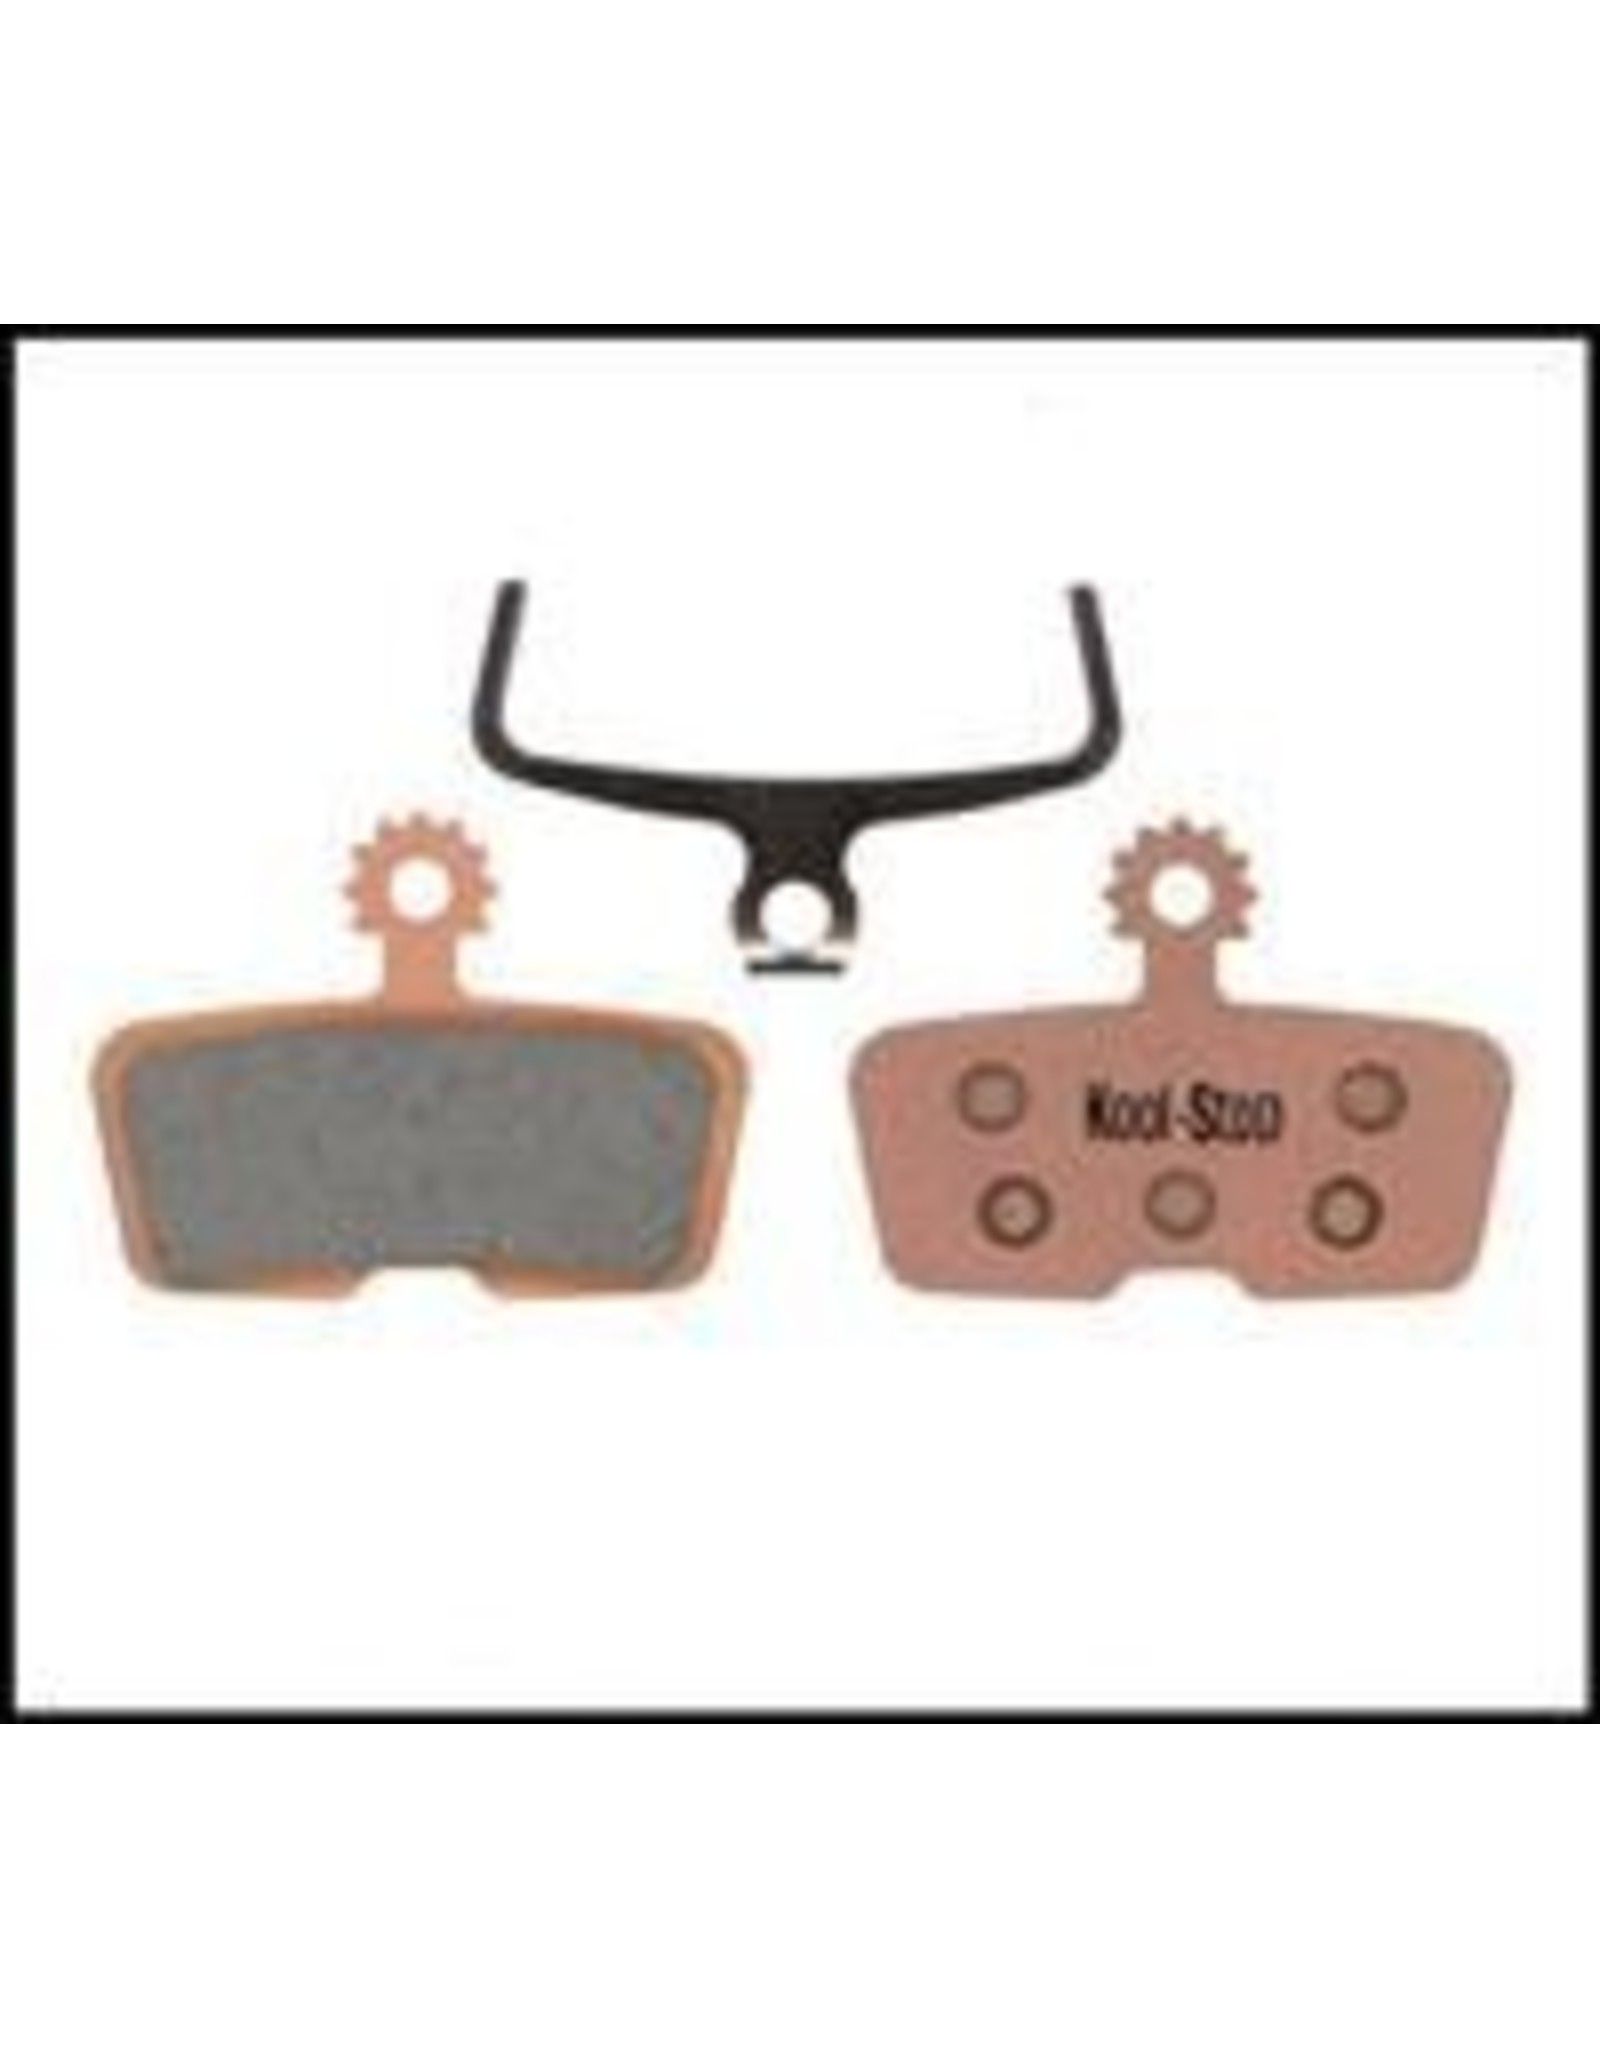 Kool Stop Kool-Stop Avid Code R (2011) Sintered Disc Brake Pads Copper Plate